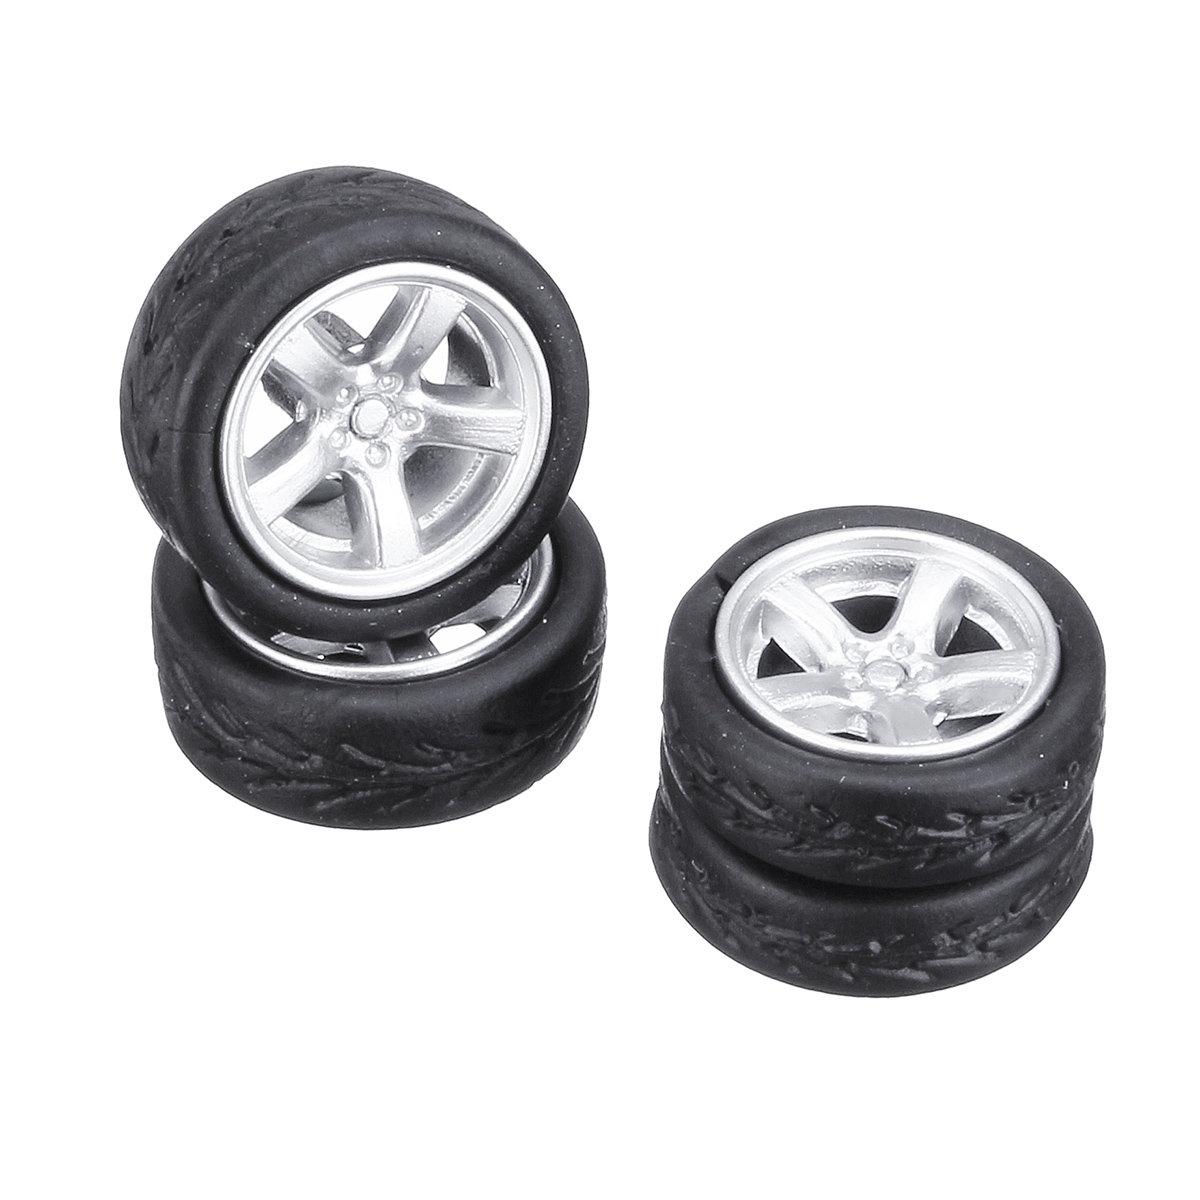 4PCS Alloy Wheels Tire Set Rims & Axles Model Car For 1/64 Modified Vehicle